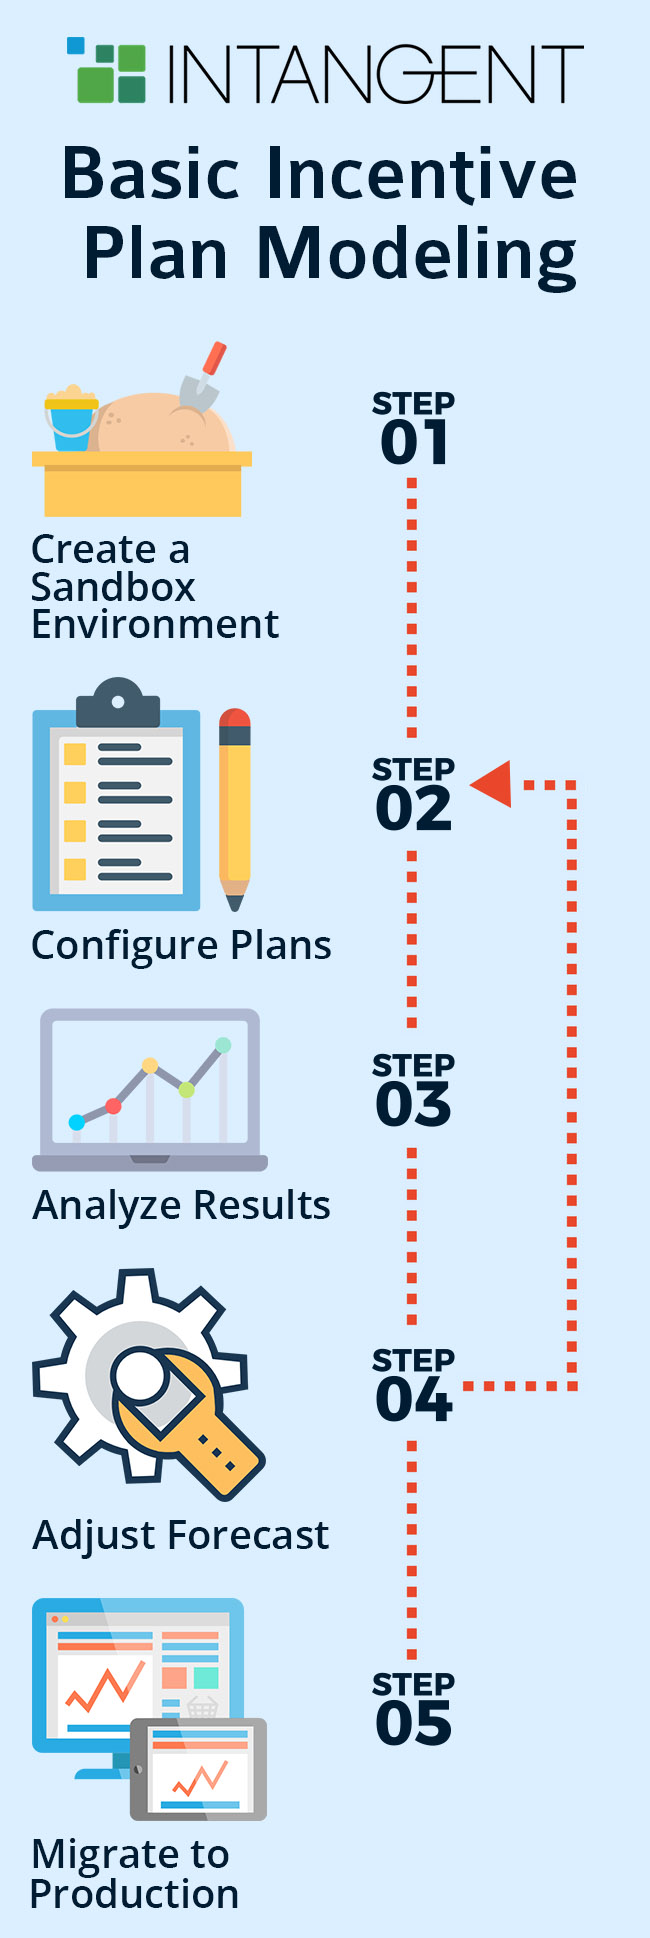 Incentive Plan Modelling.jpg